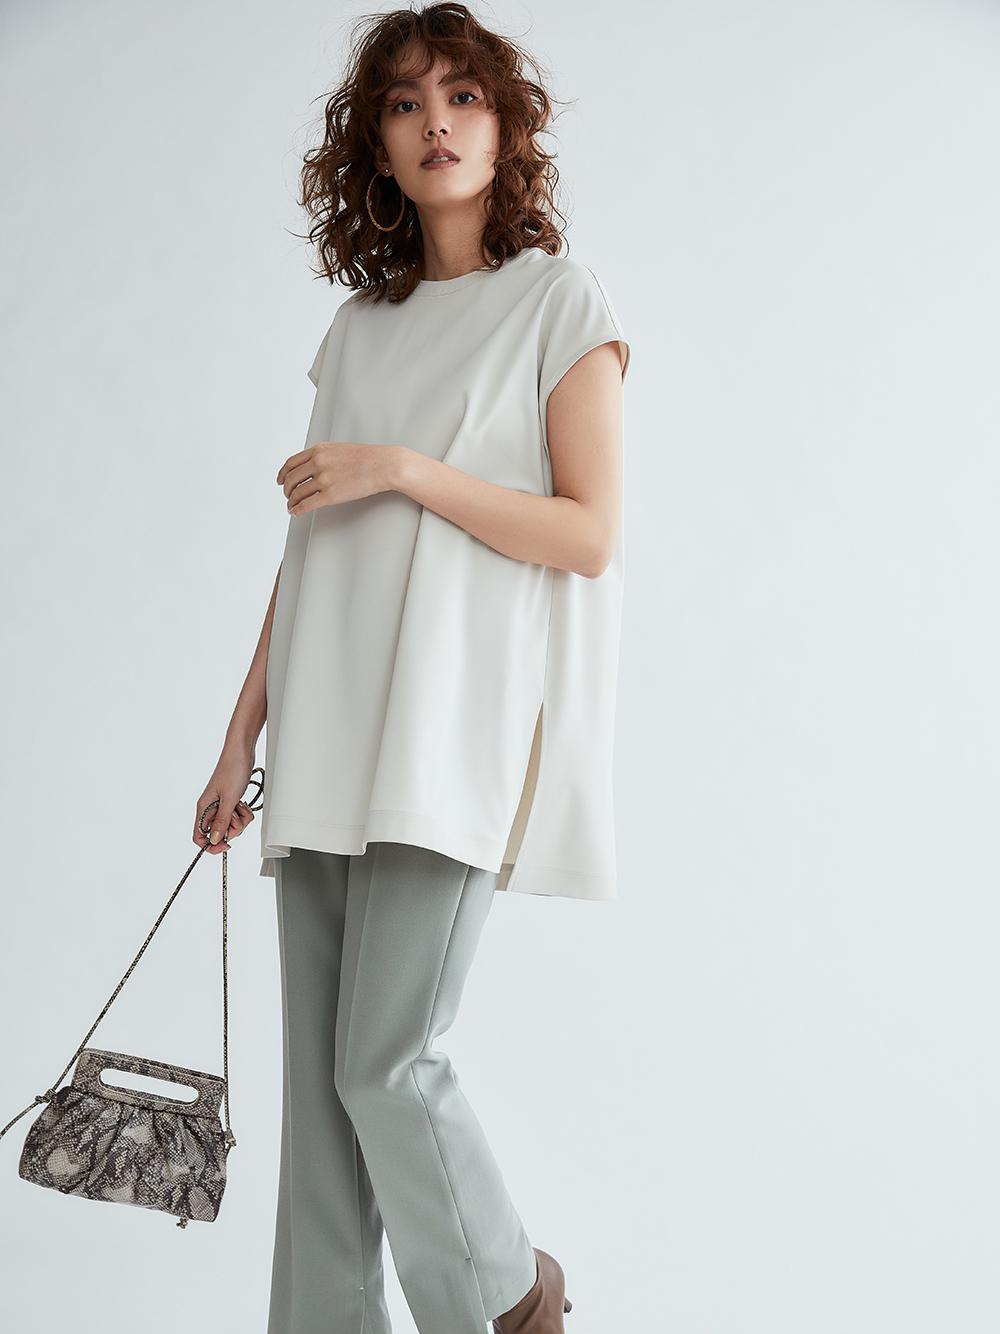 法式袖T-Shirt風上衣